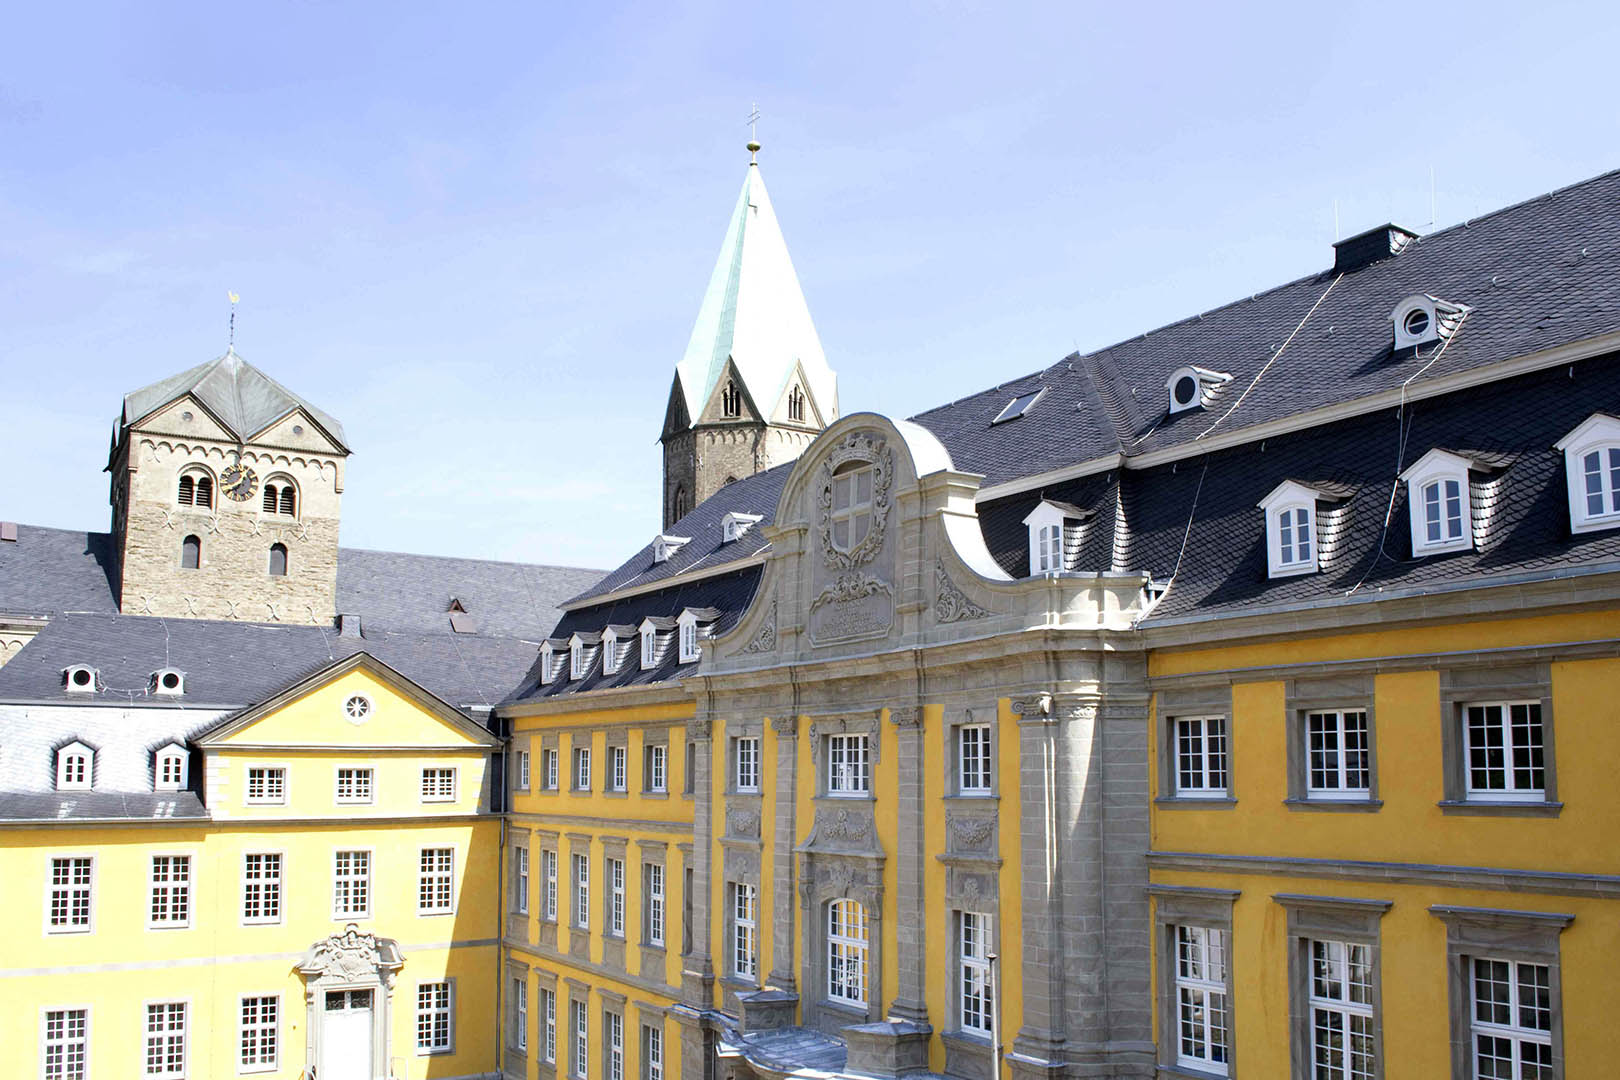 Old Abbey, Essen-Werden Campus, Folkwang University of the Arts. Photo: © Heike Kandalowski